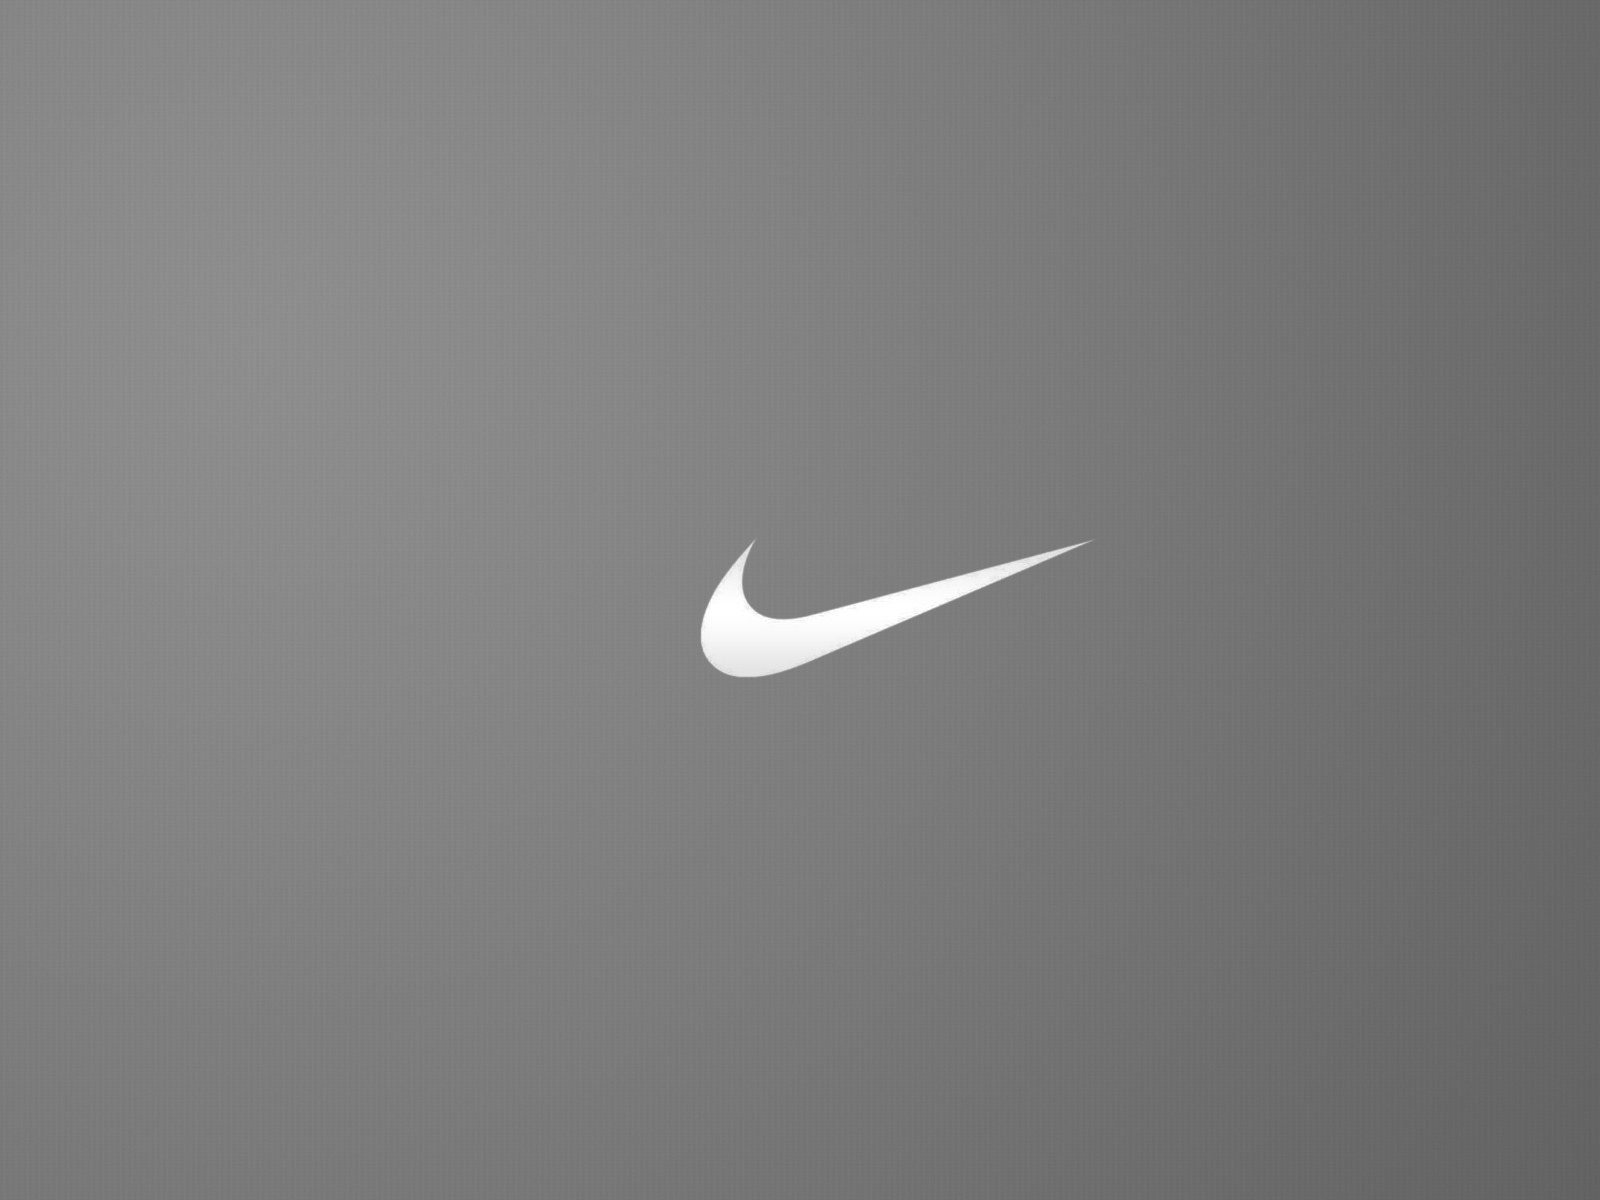 nike logo greyscale minimal hd wallpaper nike tick logo by tie nike 1600x1200